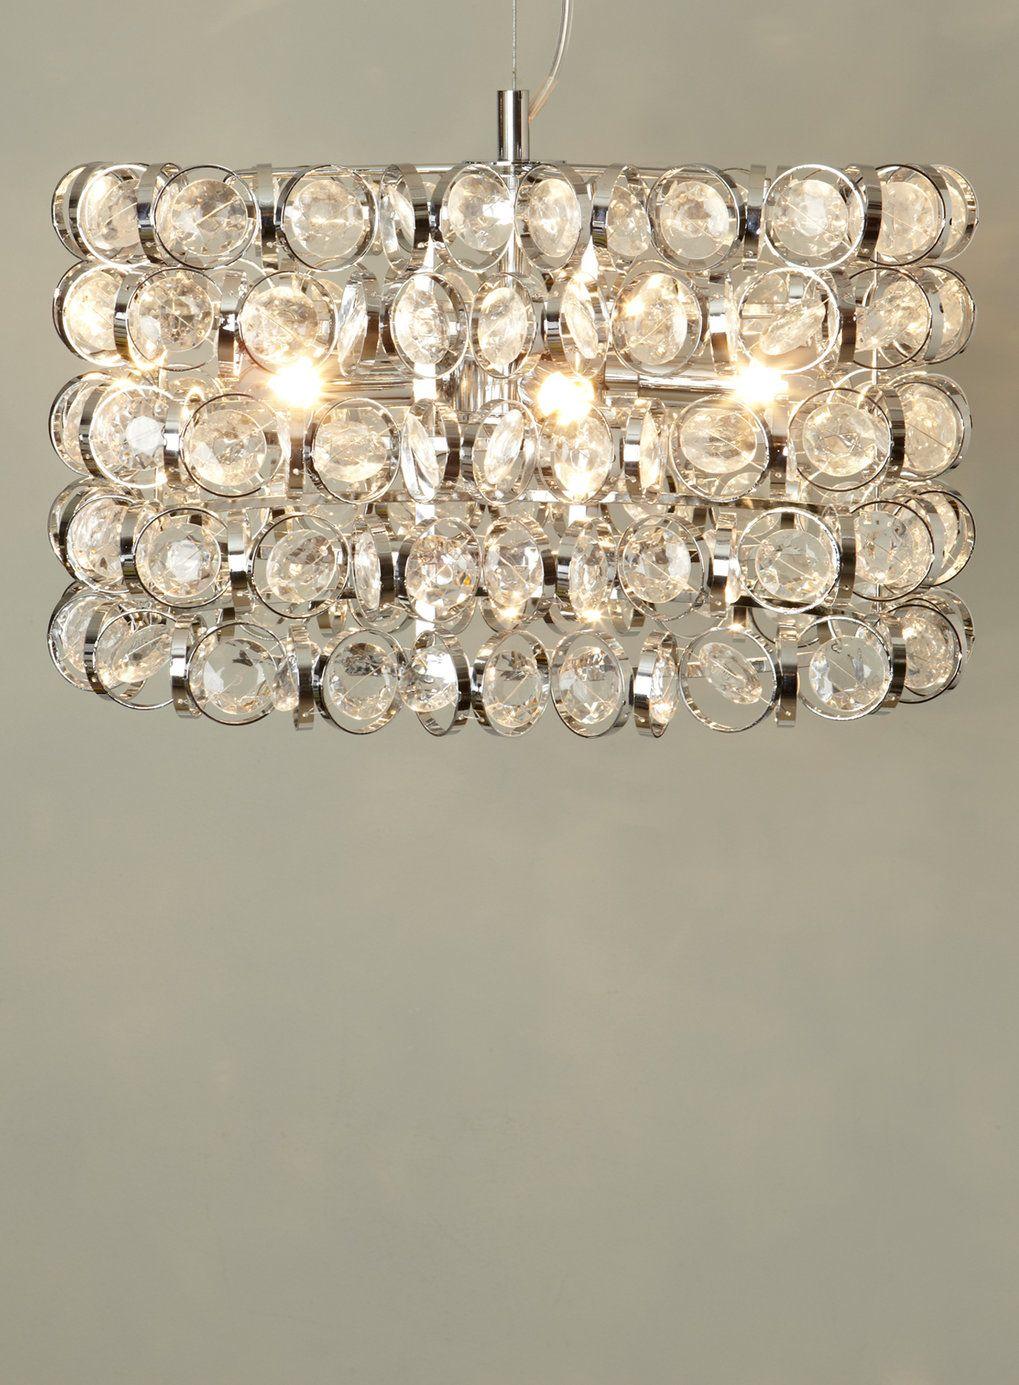 Nina pendant bhs 22000 bought for 11000 living room nina pendant bhs 22000 bought for 11000 mozeypictures Choice Image